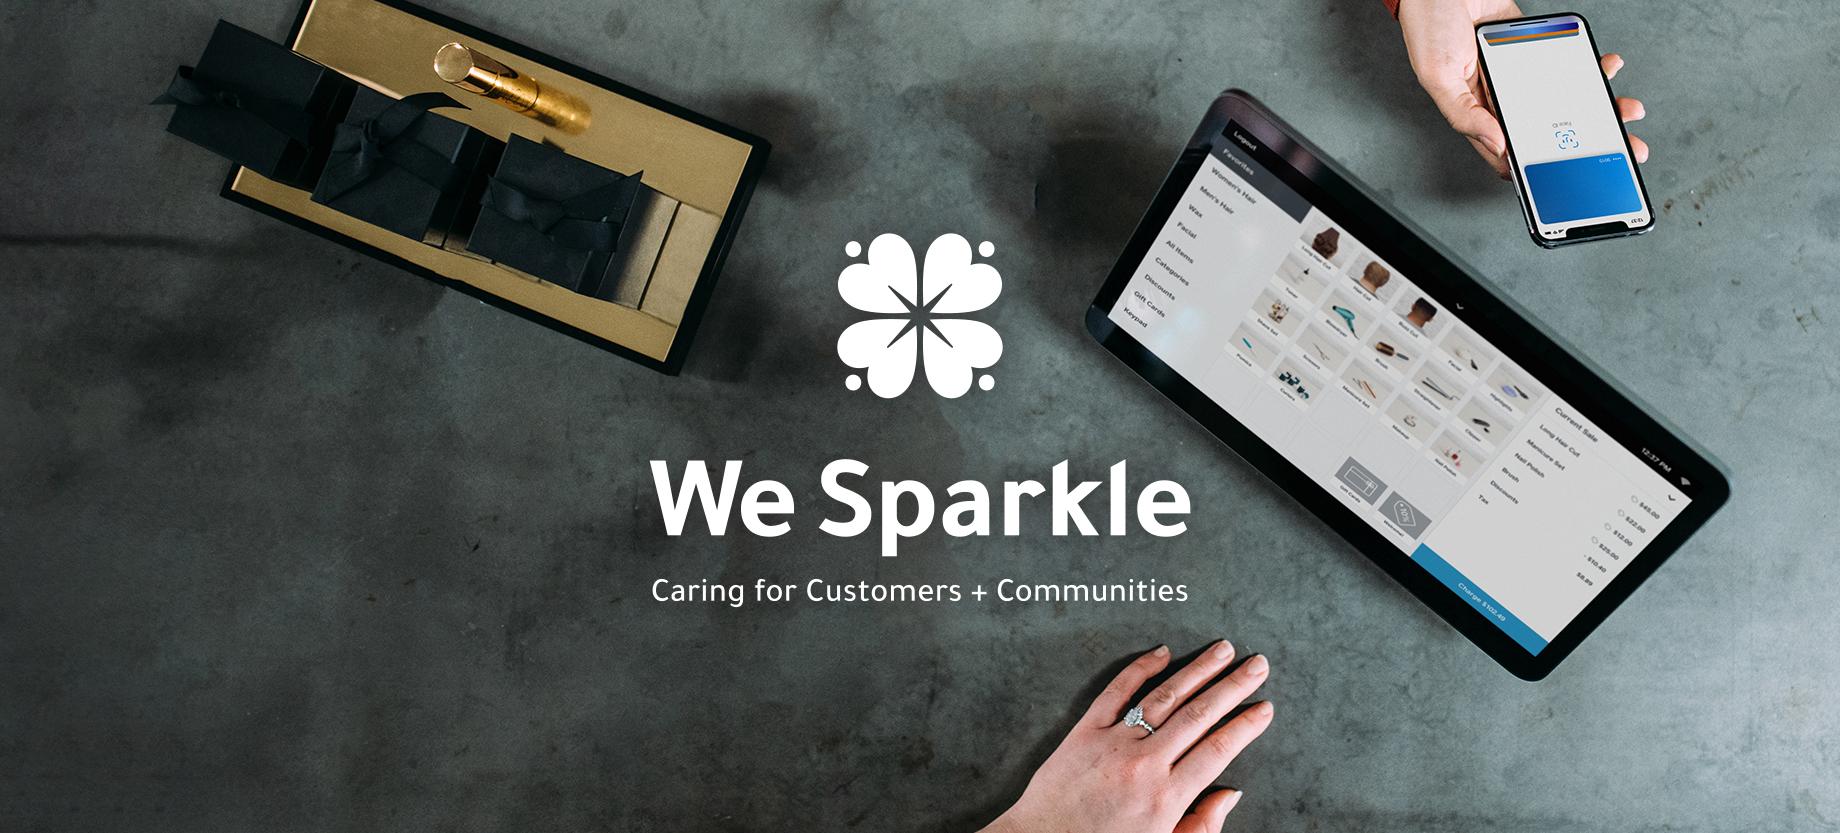 Photo of digital transaction with We Sparkle logo